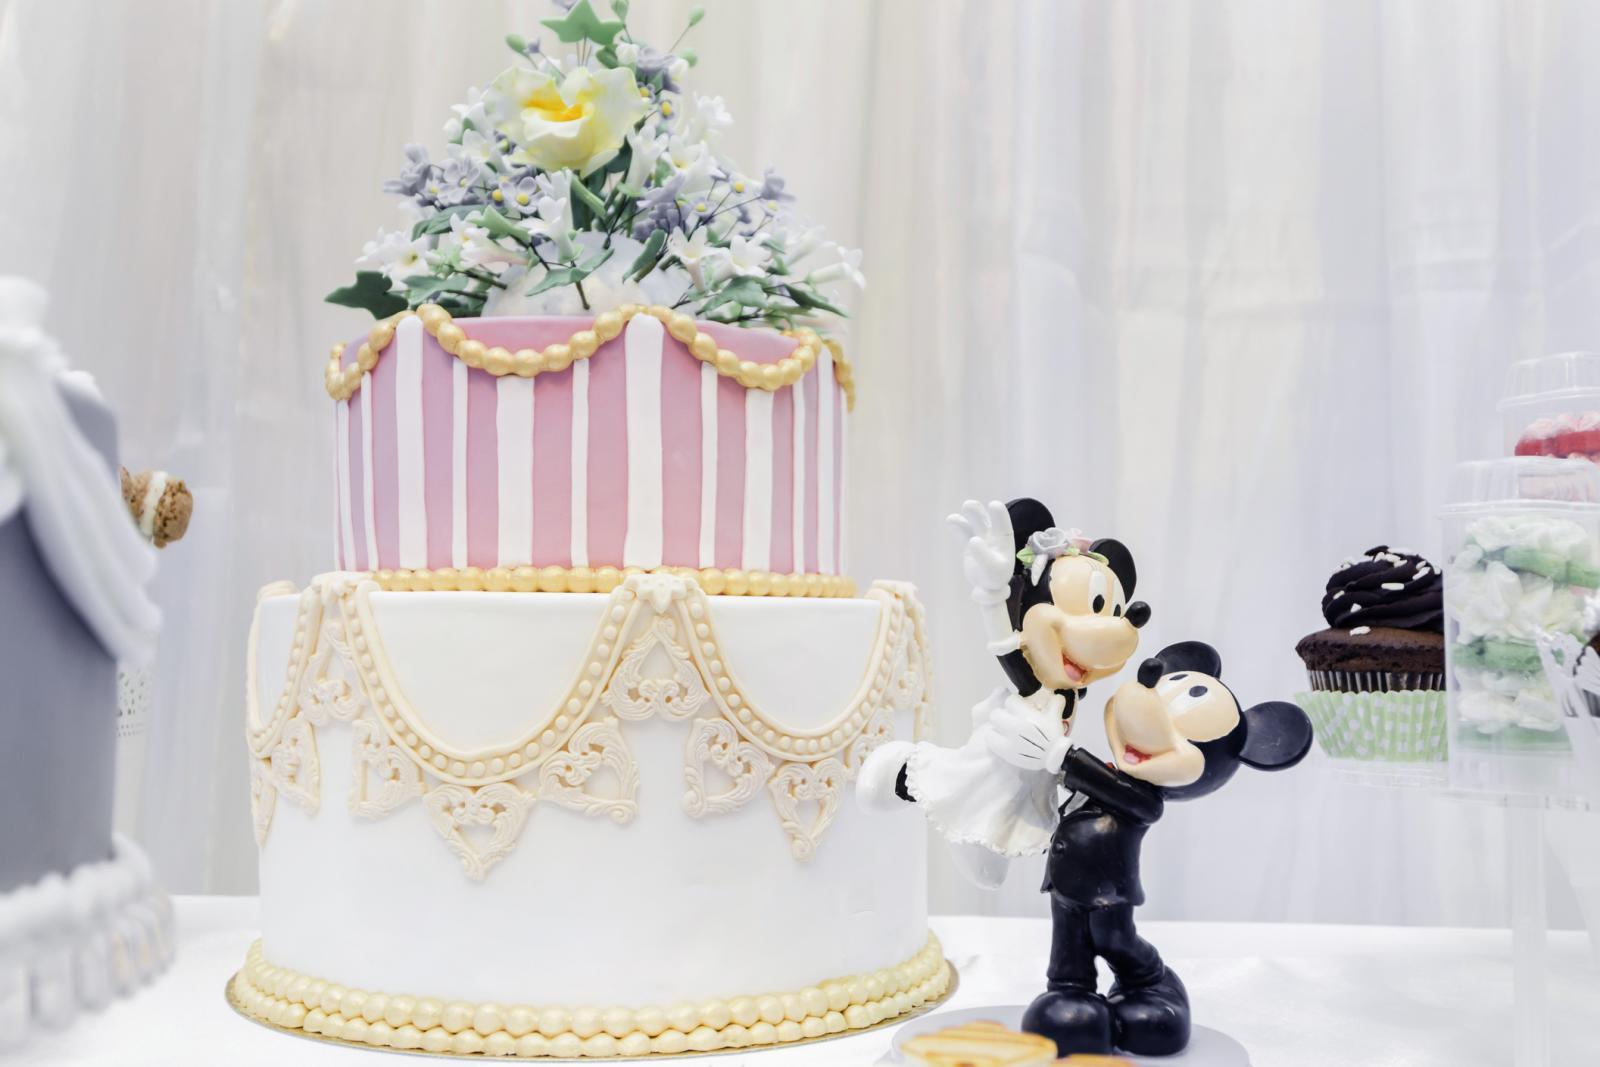 Miniature marzipan Mickey and Minnie wedding cake